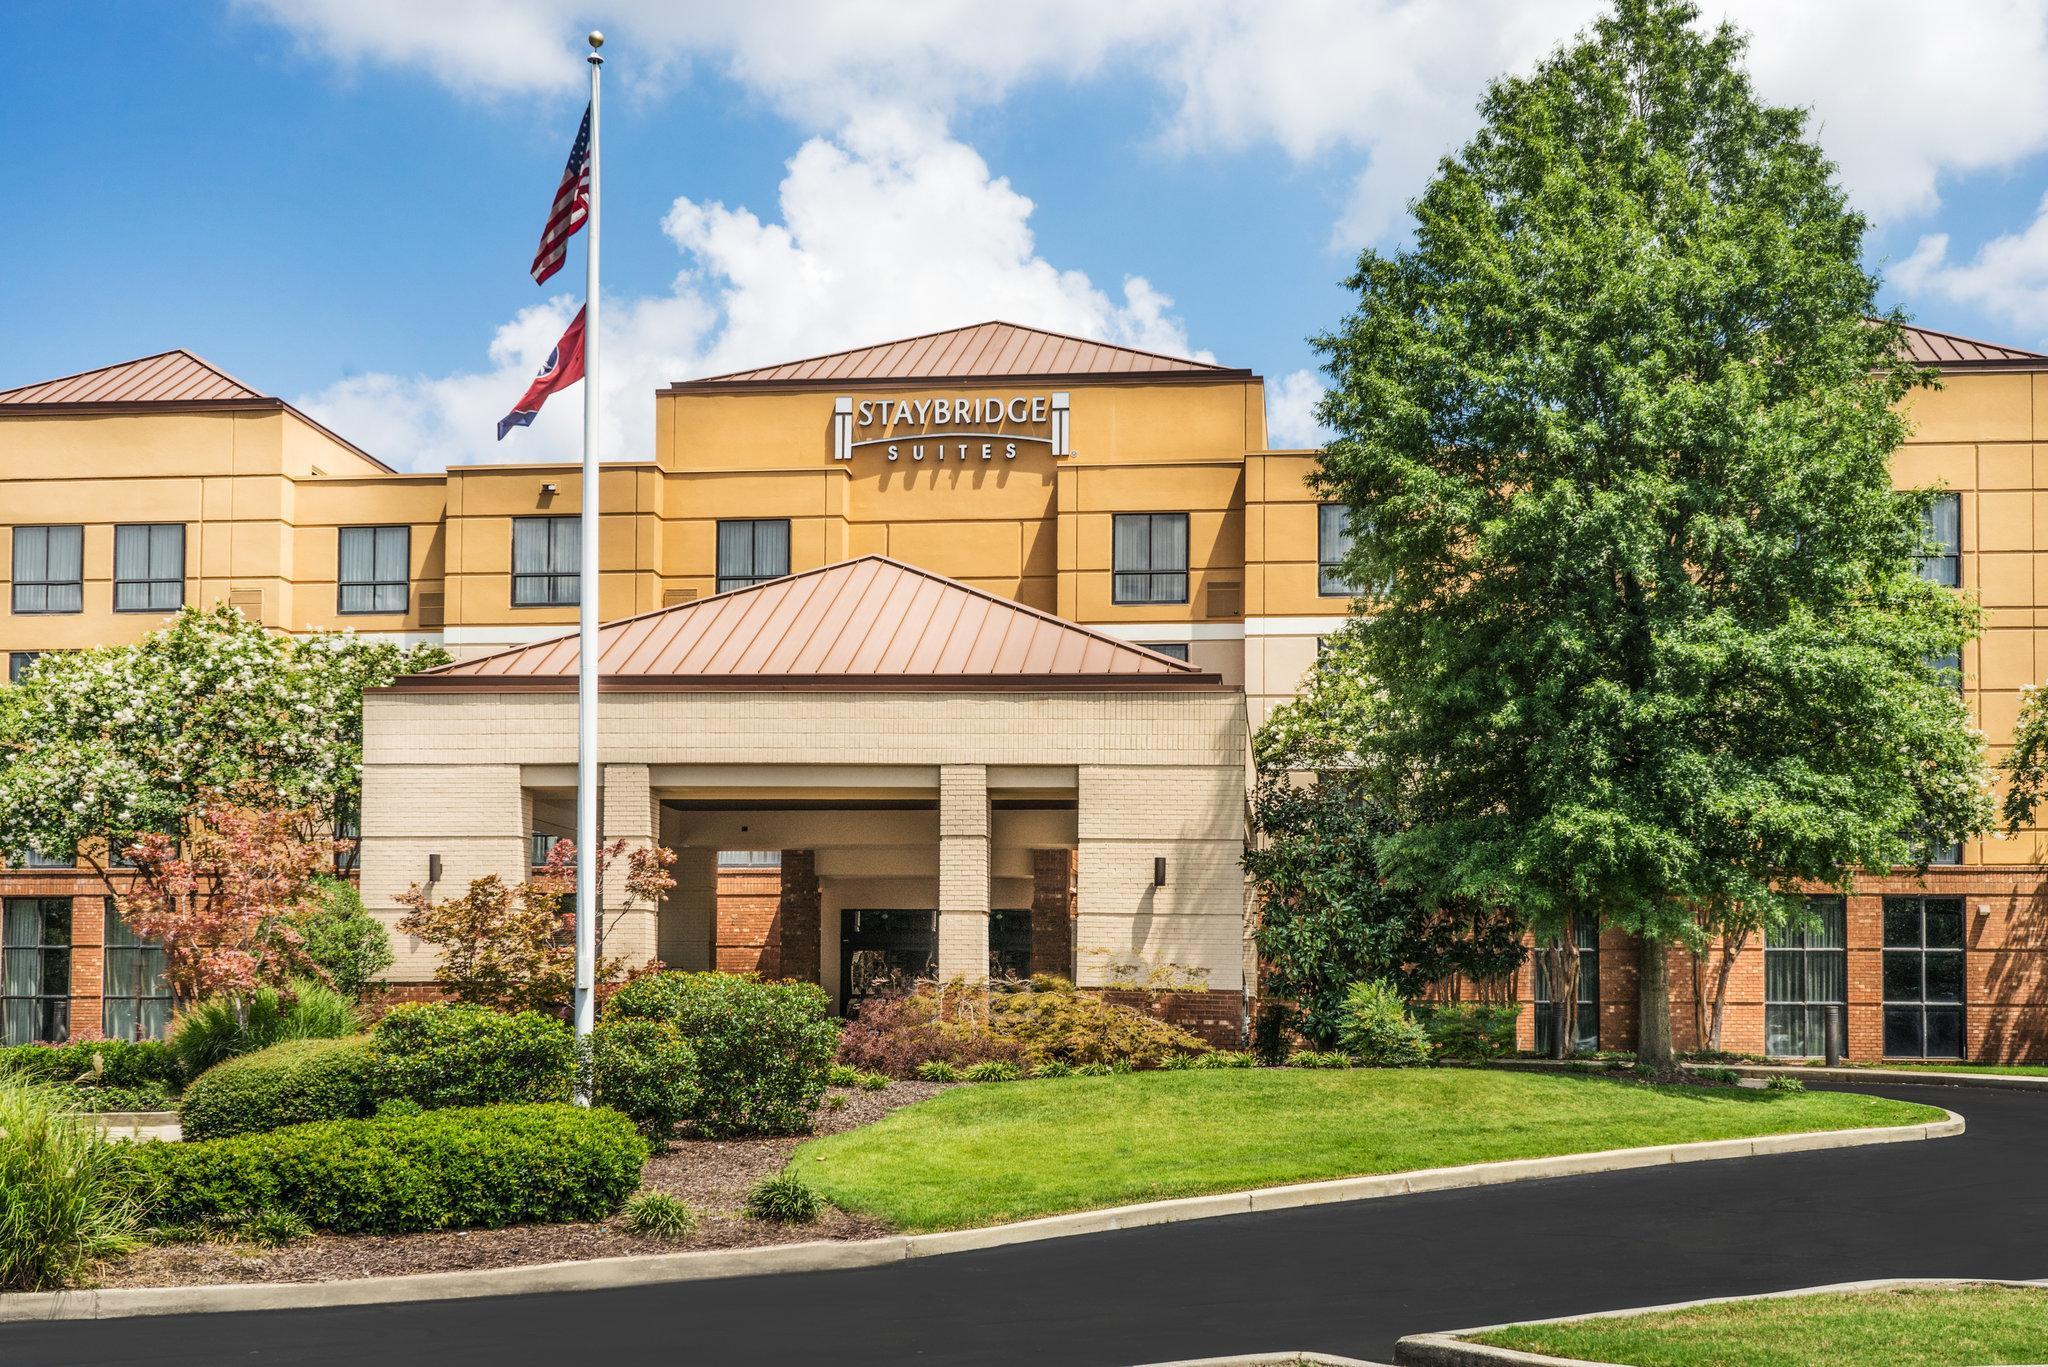 Staybridge Suites Memphis Poplar Ave East